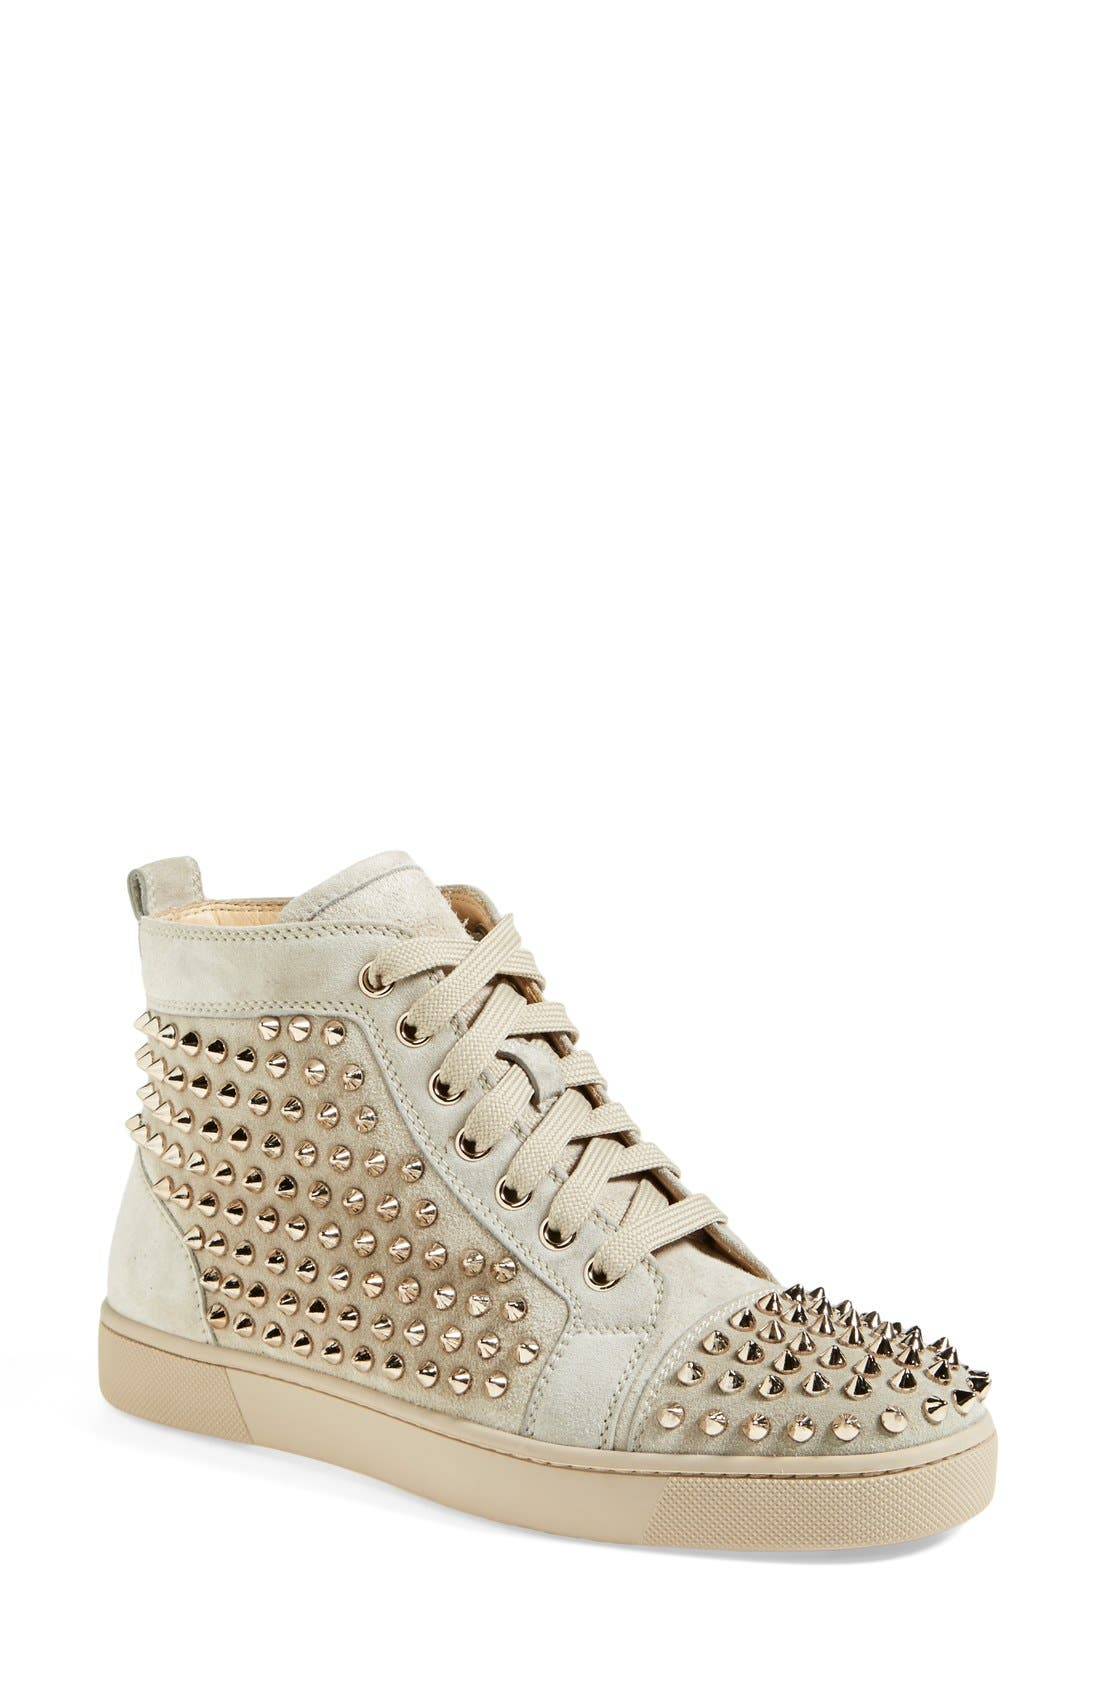 Main Image - Christian Louboutin 'Louis' Spiked Sneaker